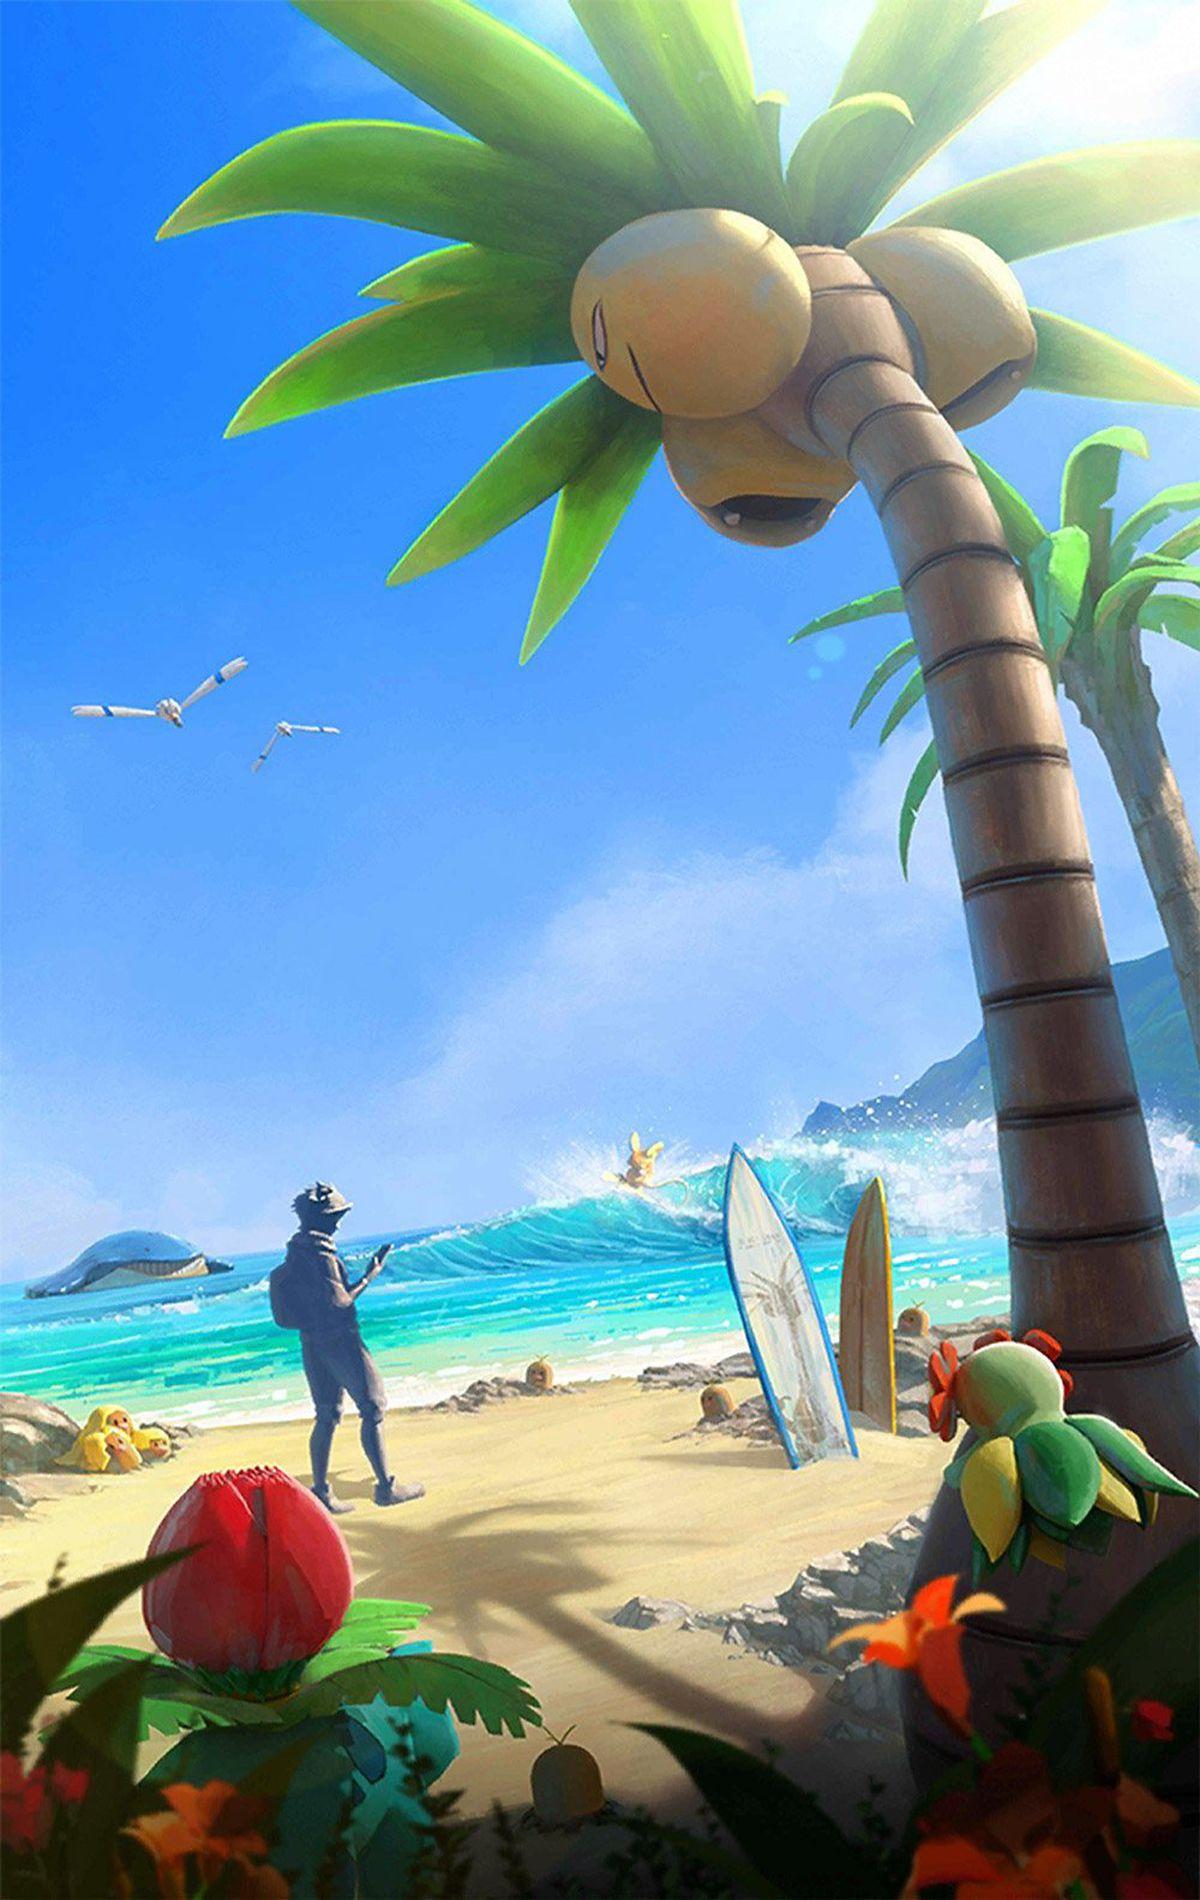 Pokemon GO Animation Week 2020: Tasks and Rewards